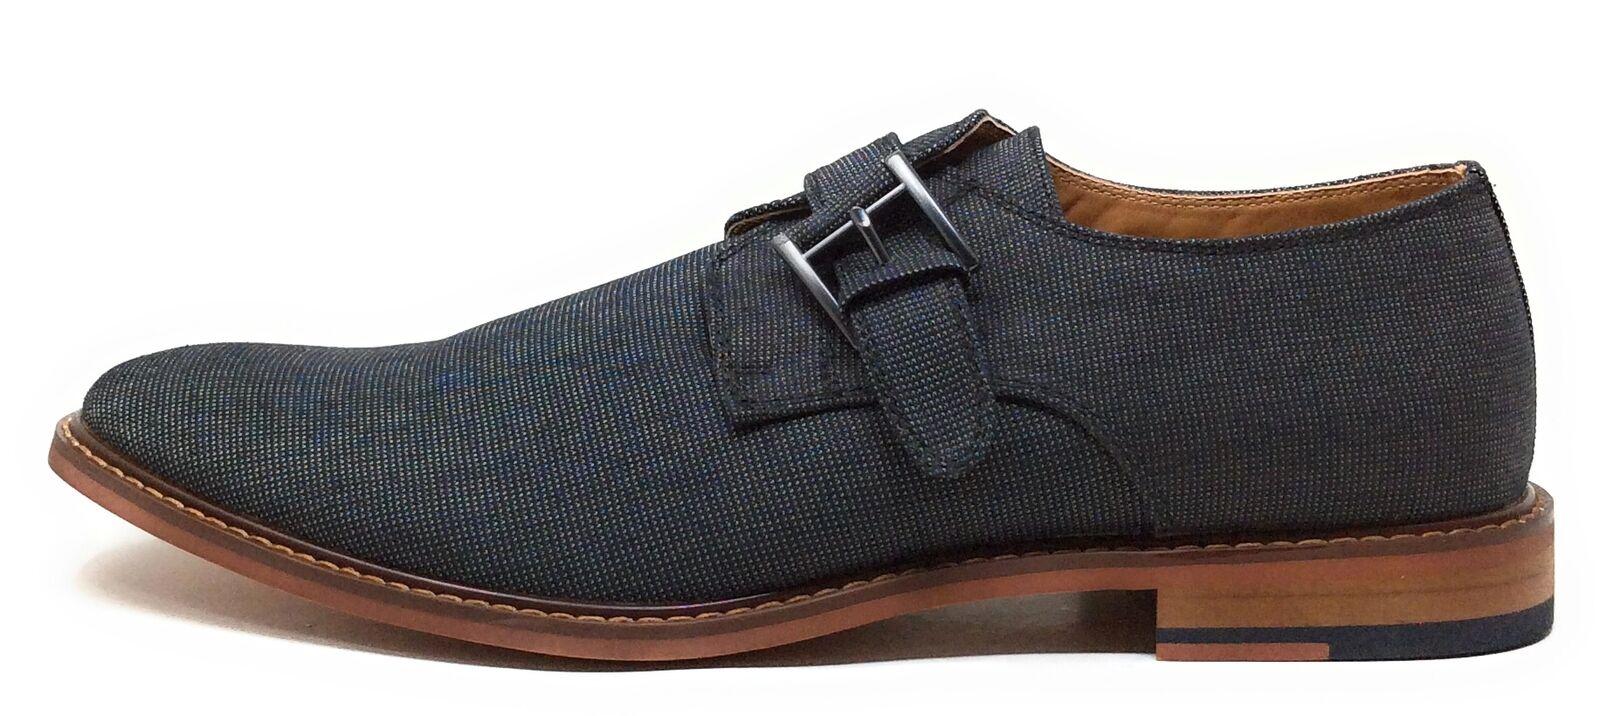 J75 By Jump Mens Parlay BLK C Monk Strap Oxford Dress Shoes Black Size 11 M